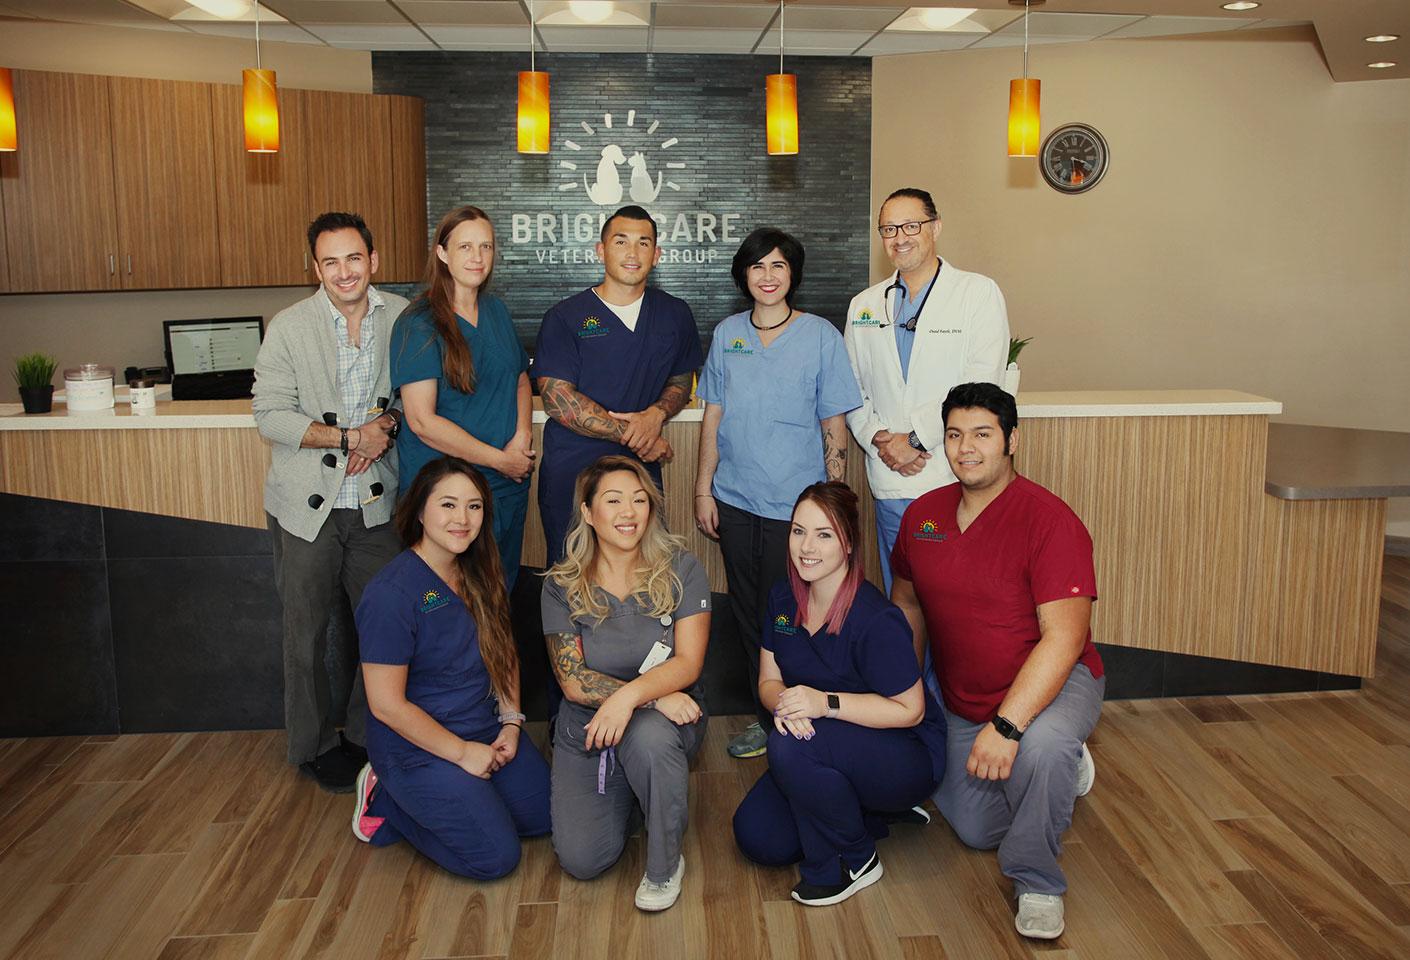 BrightCare Veterinary Group - Staff